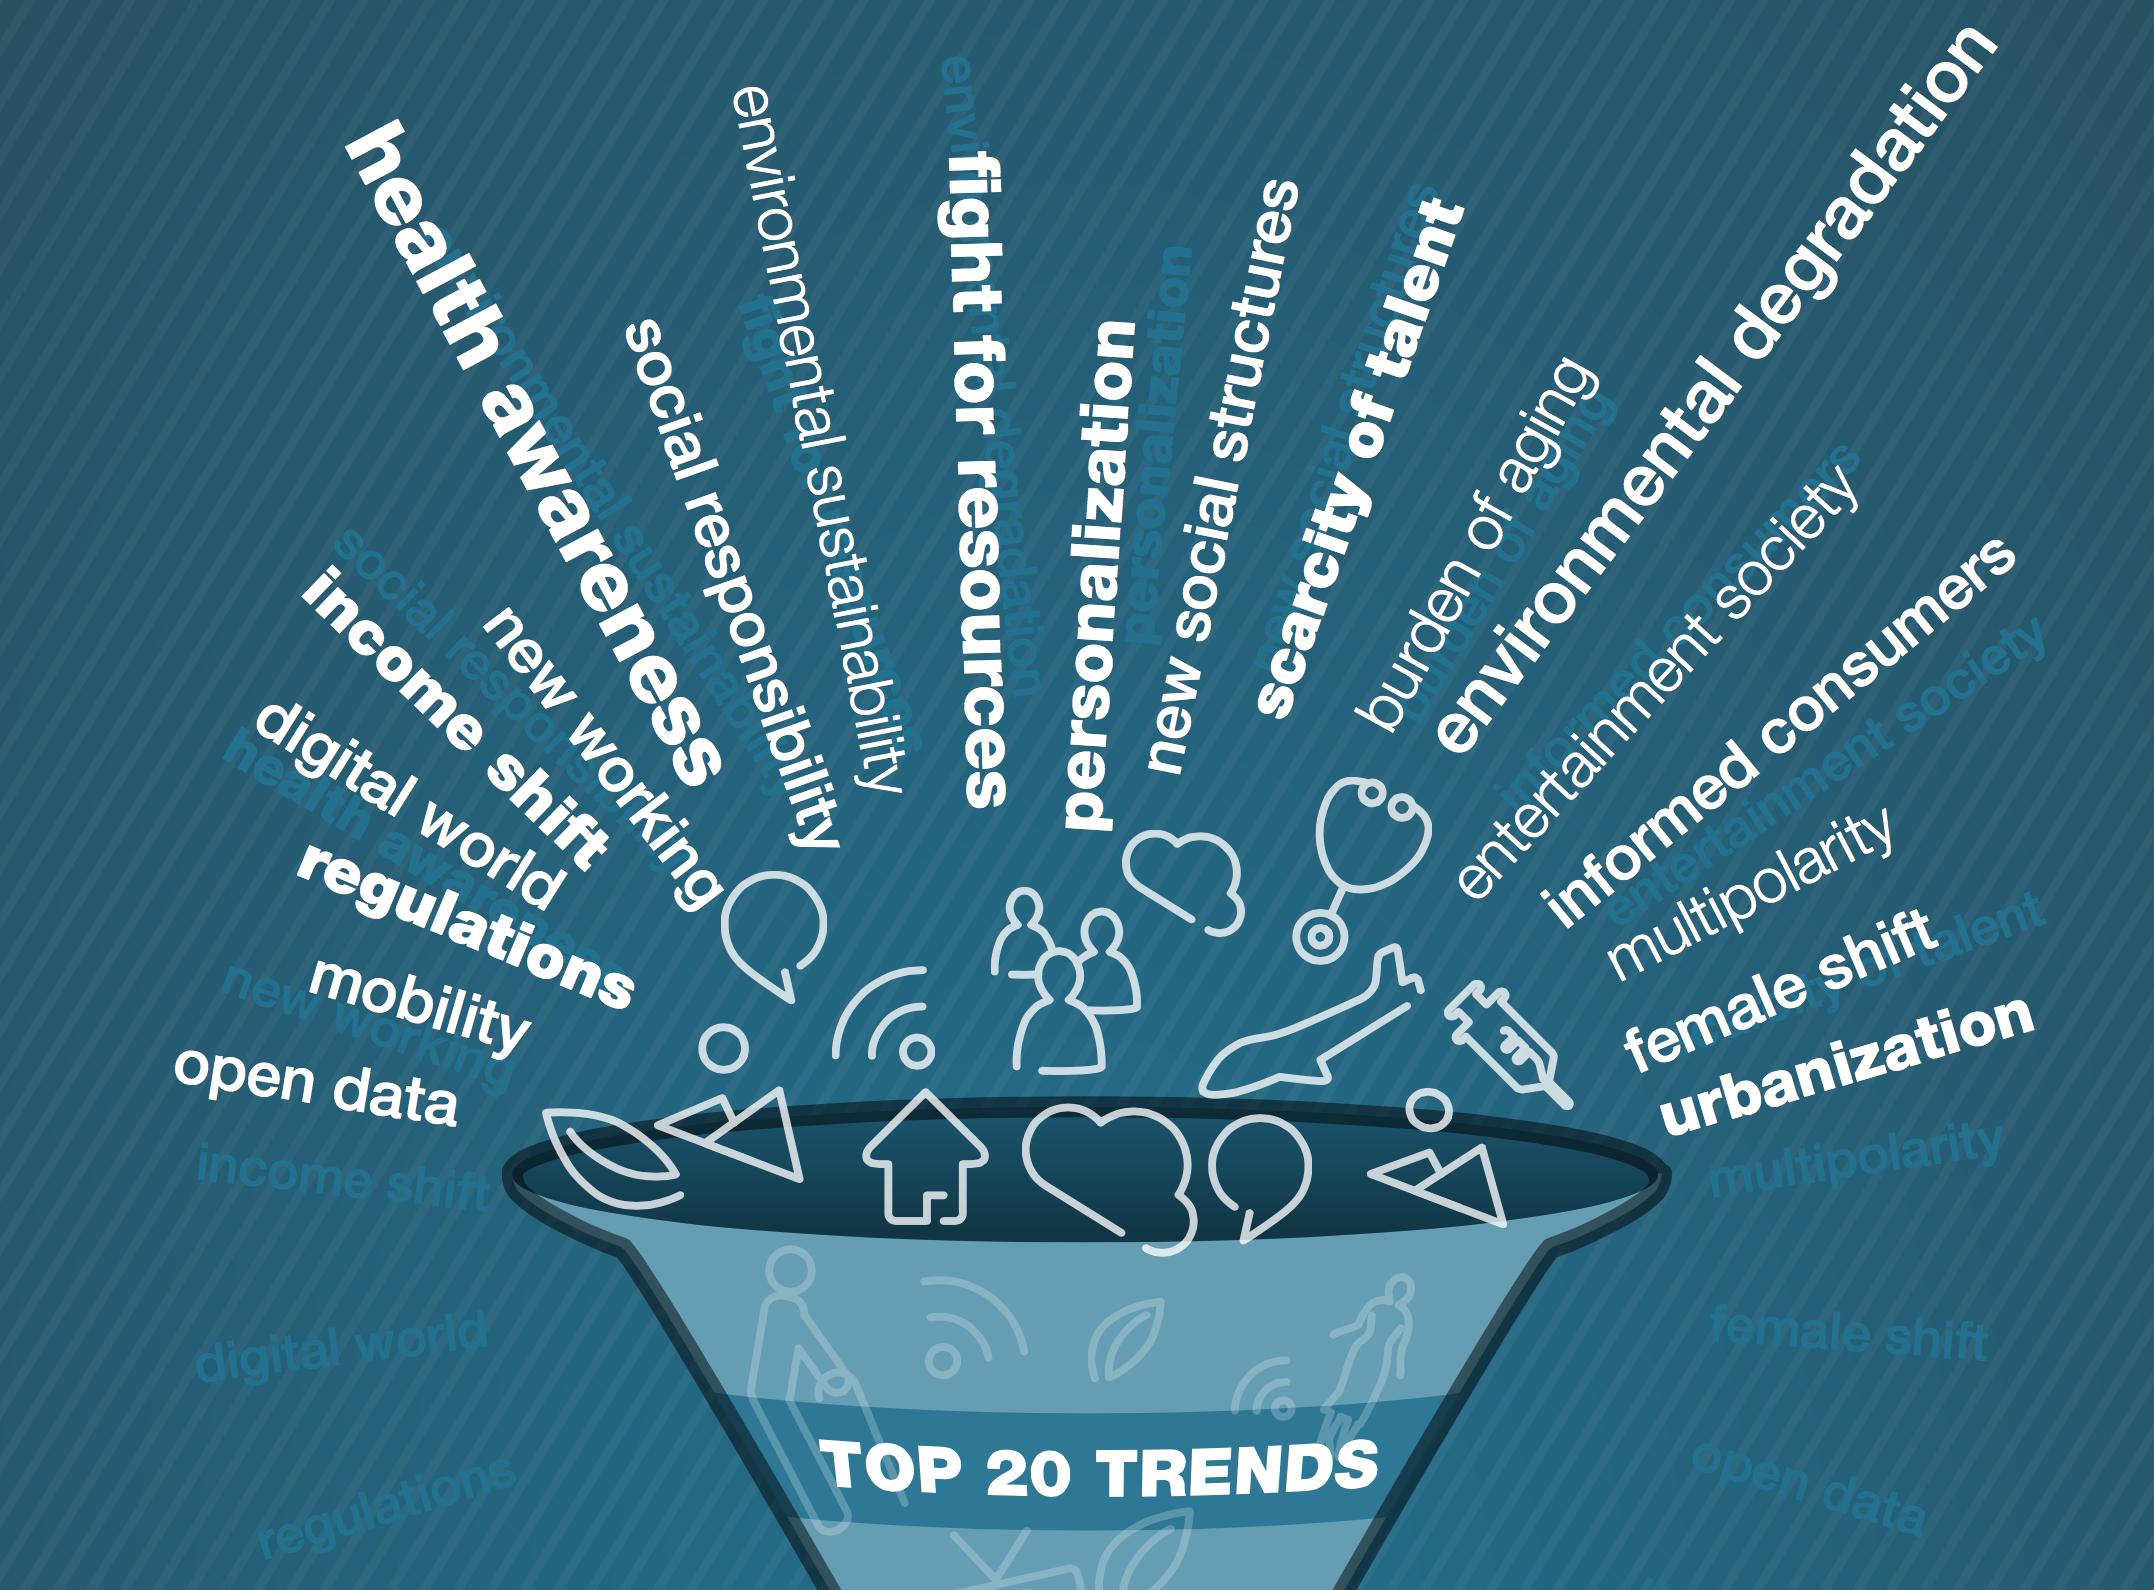 Top 20 trends retail LAM.png